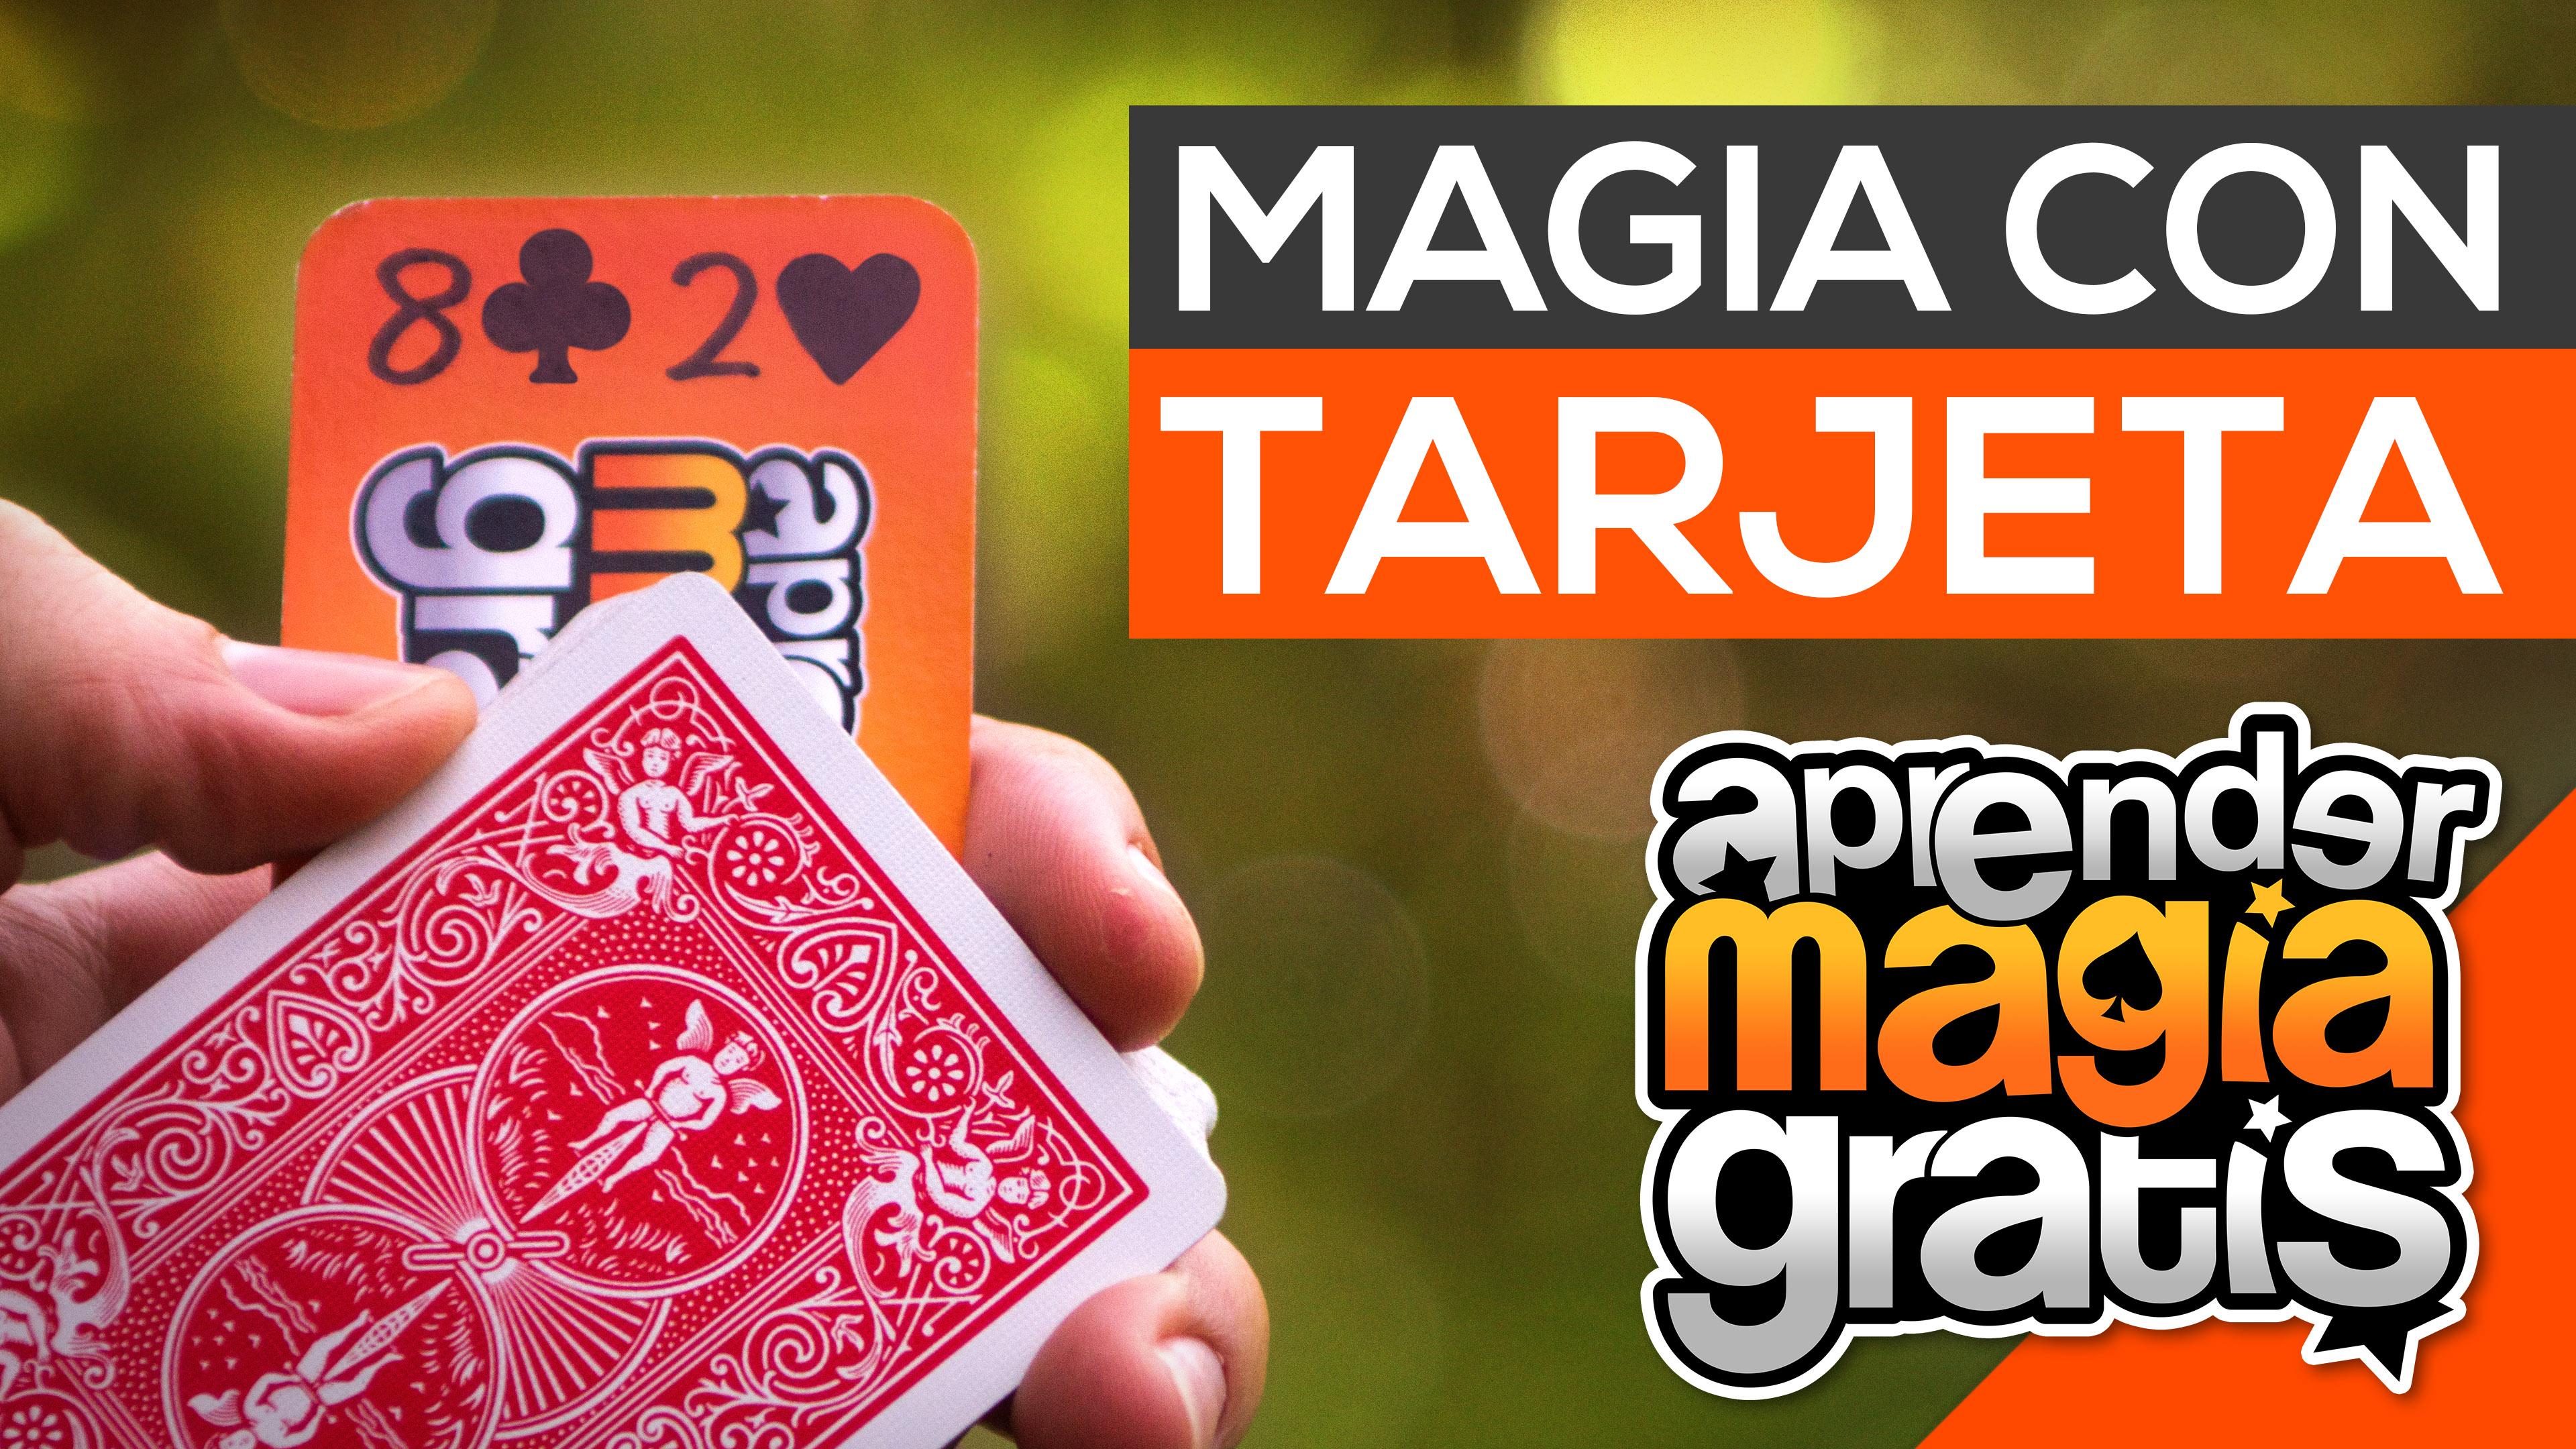 magia con tarjeta